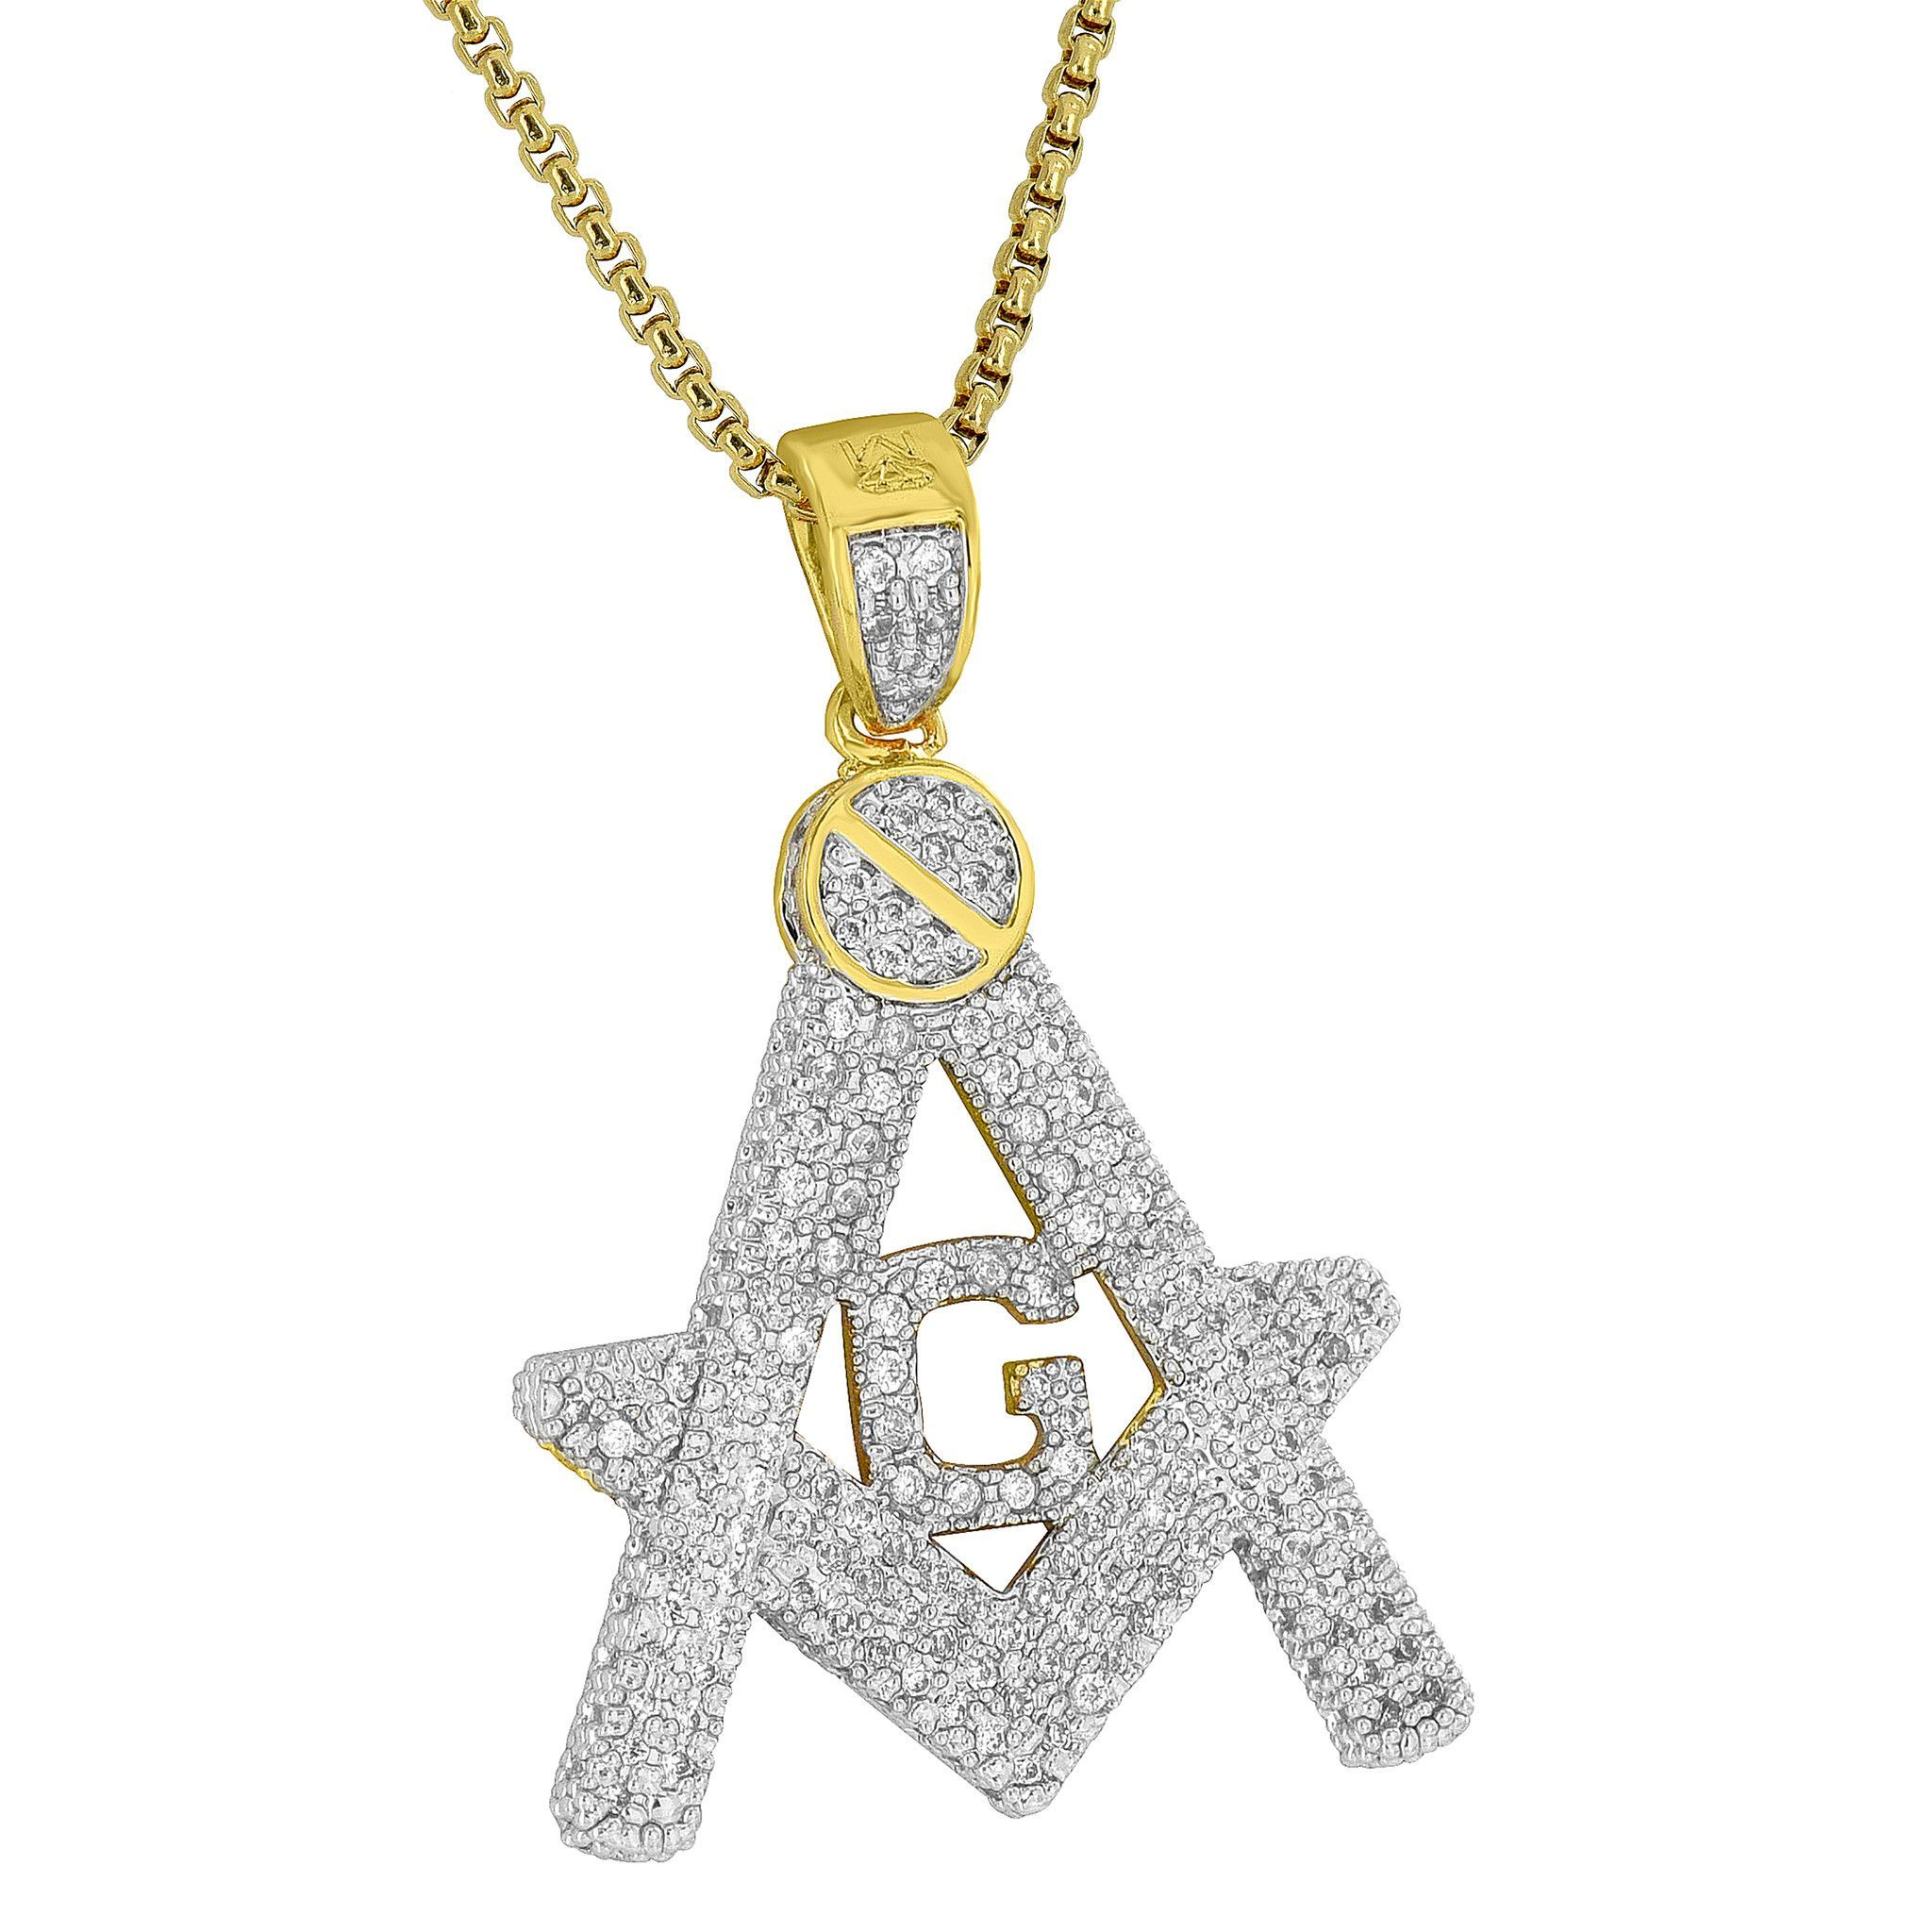 Freemason masonic g pendant iced out 18k gold plated steel necklace freemason masonic g pendant iced out 18k gold plated steel necklace religious aloadofball Gallery